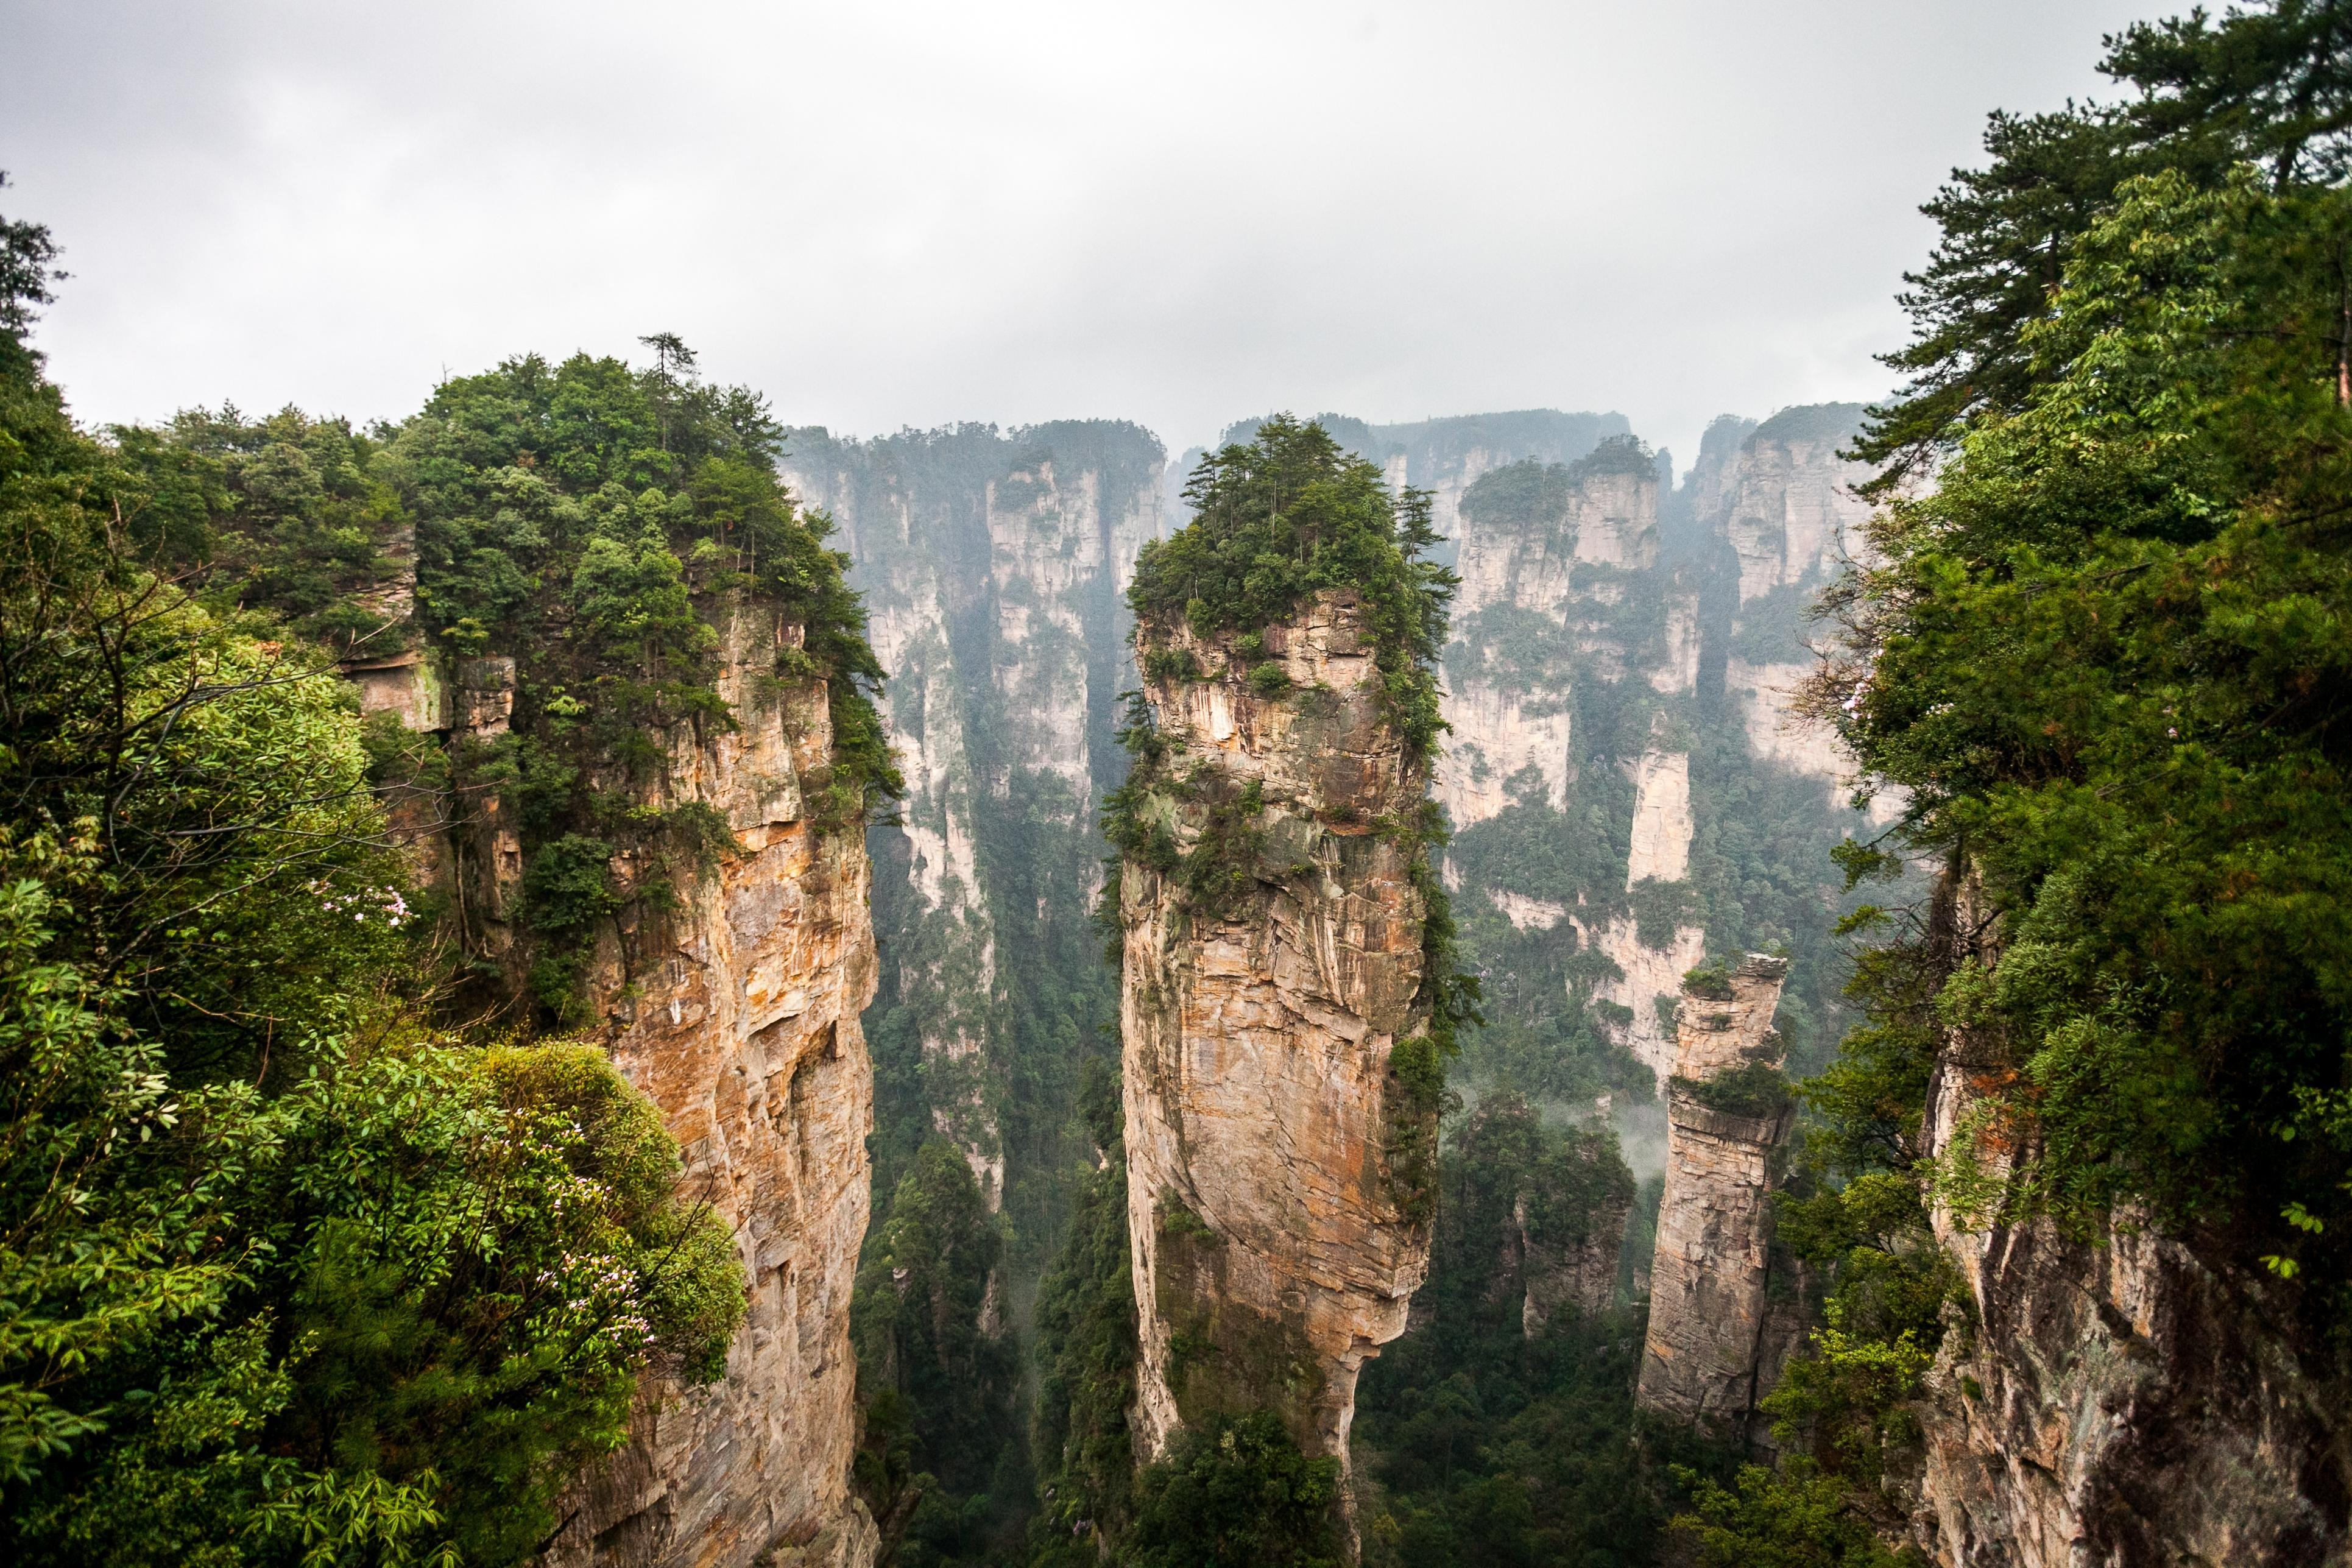 How to Spend 1 Day in Zhangjiajie